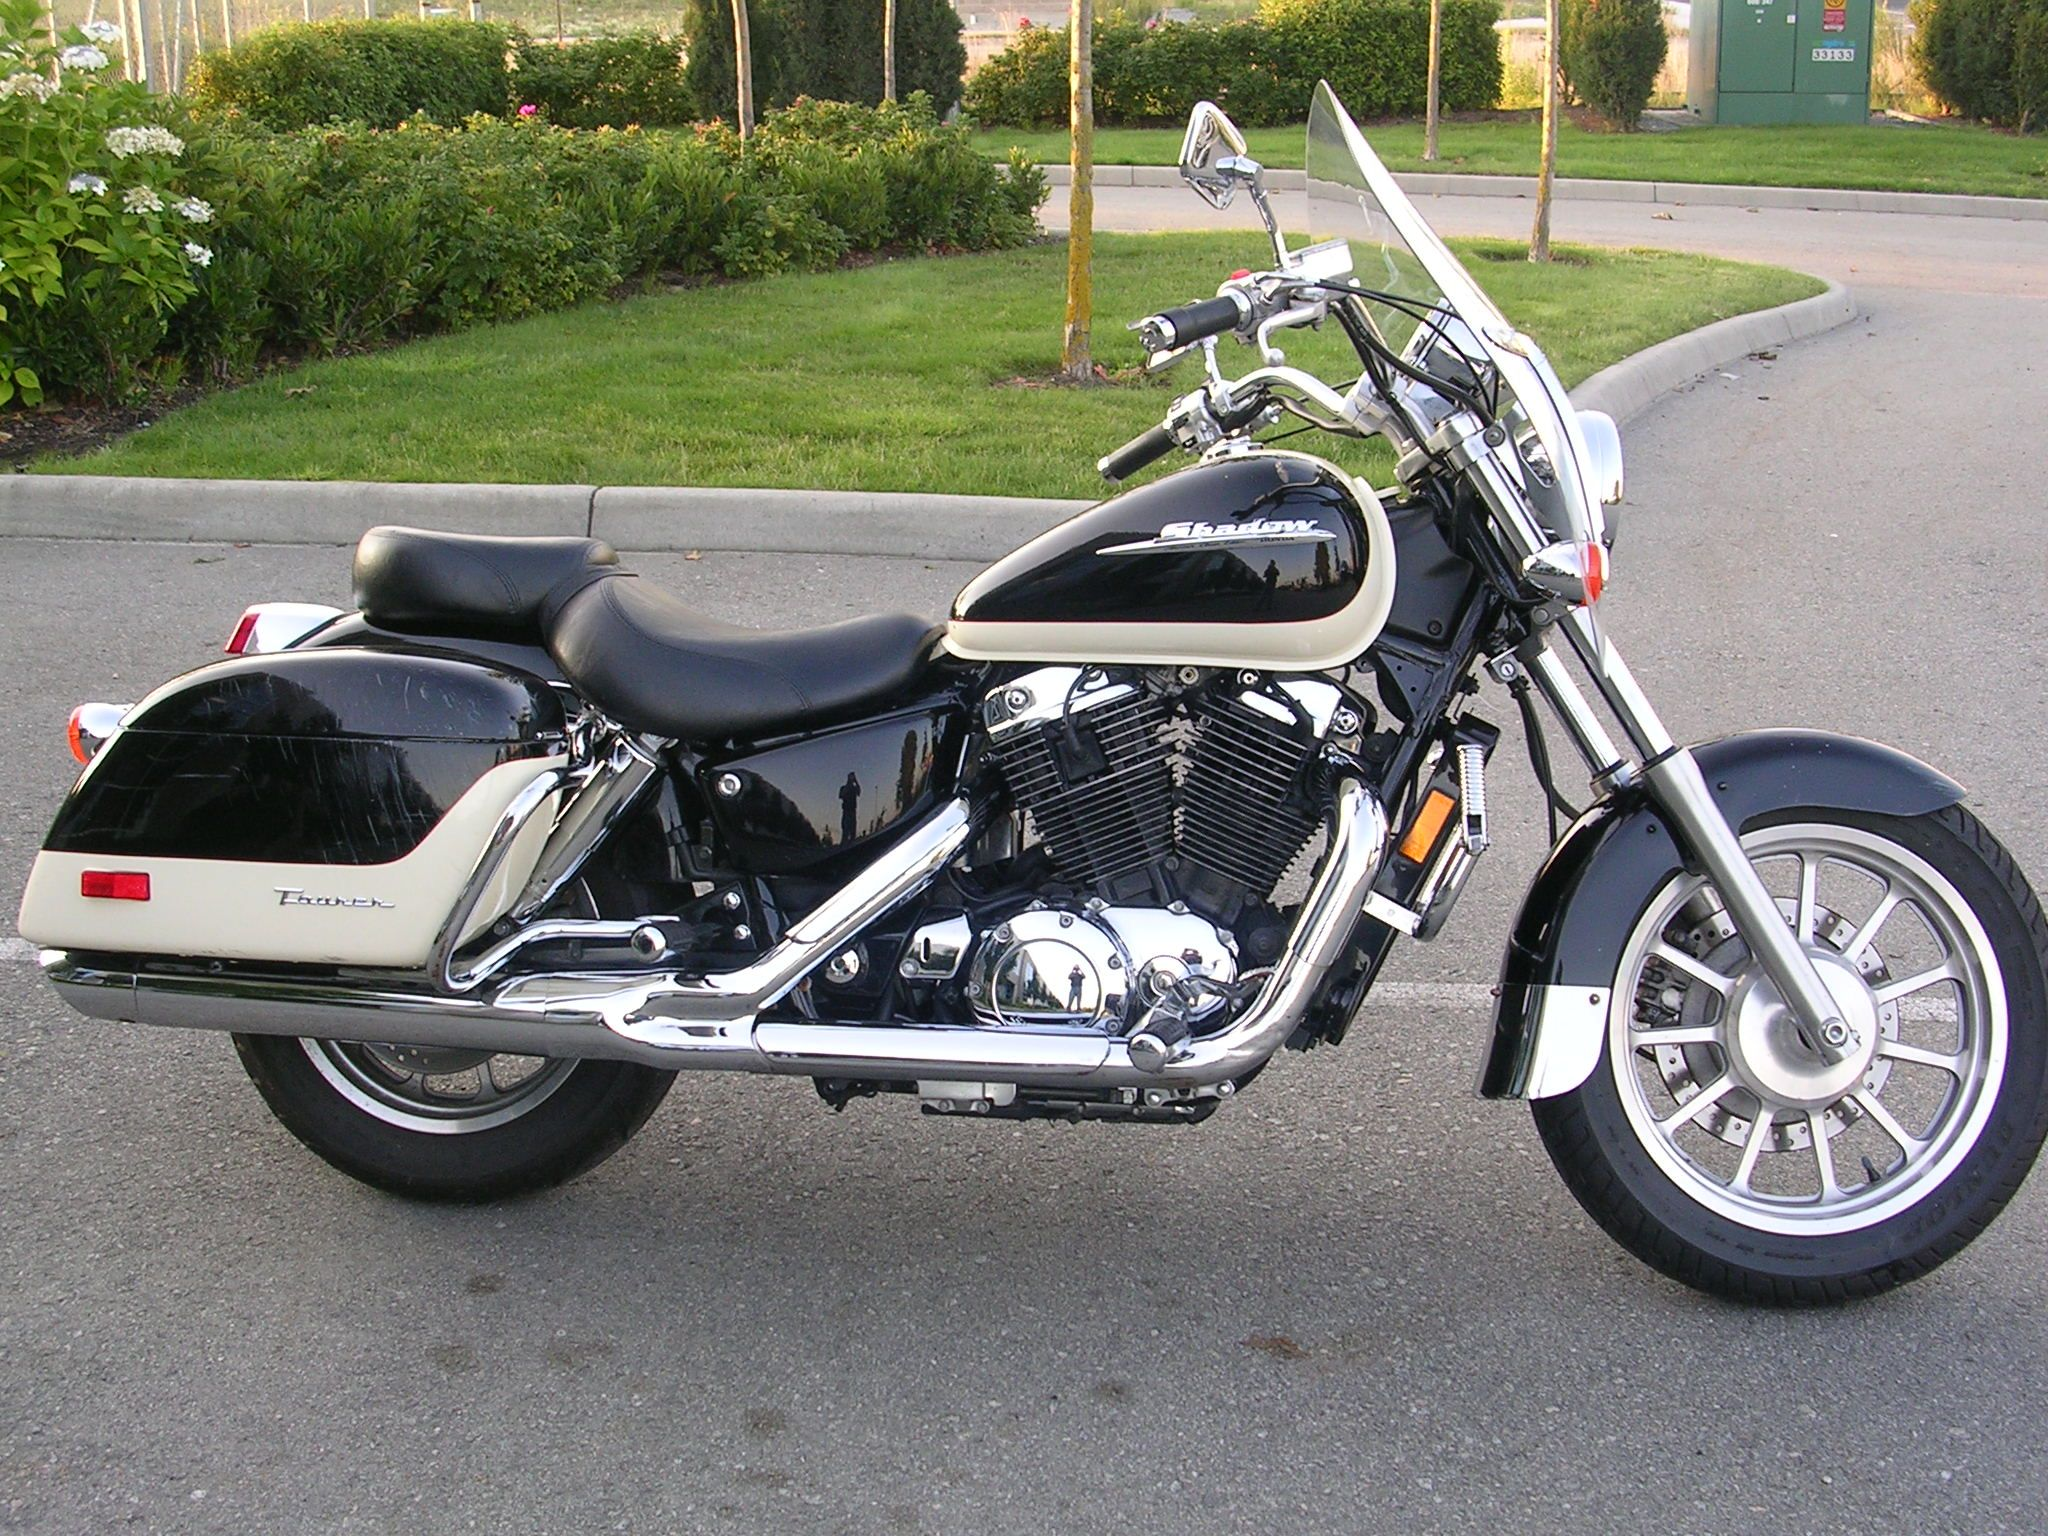 hight resolution of honda shadow 1100 touring edition the honda shadow a merican c lassic e dition tourer model vt1100t